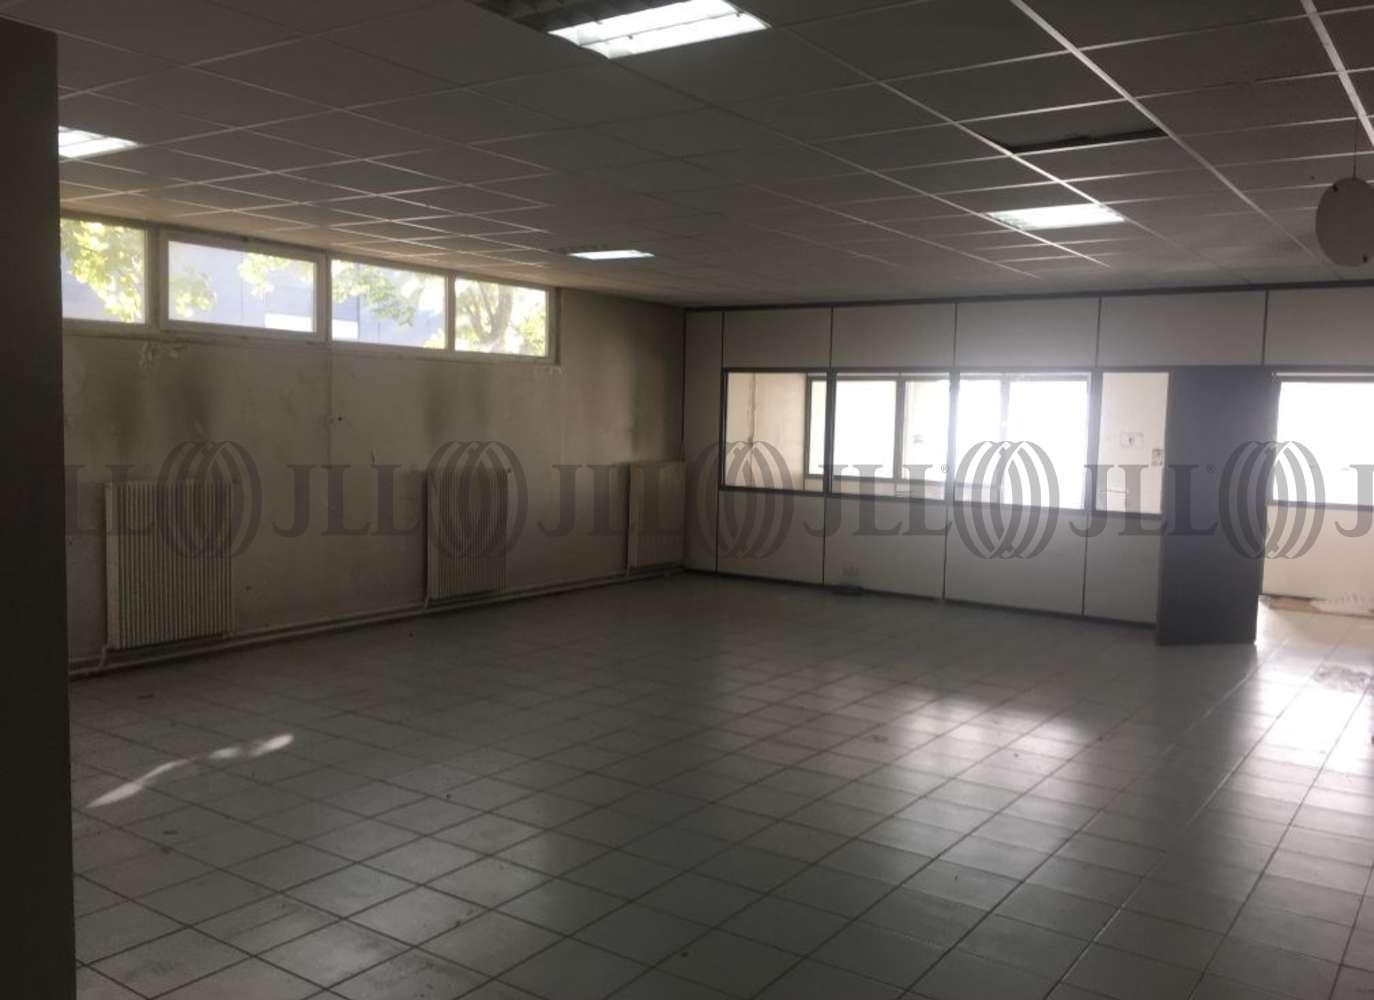 Activités/entrepôt Cergy, 95000 - 43 RUE FRANCIS COMBES - 10736069